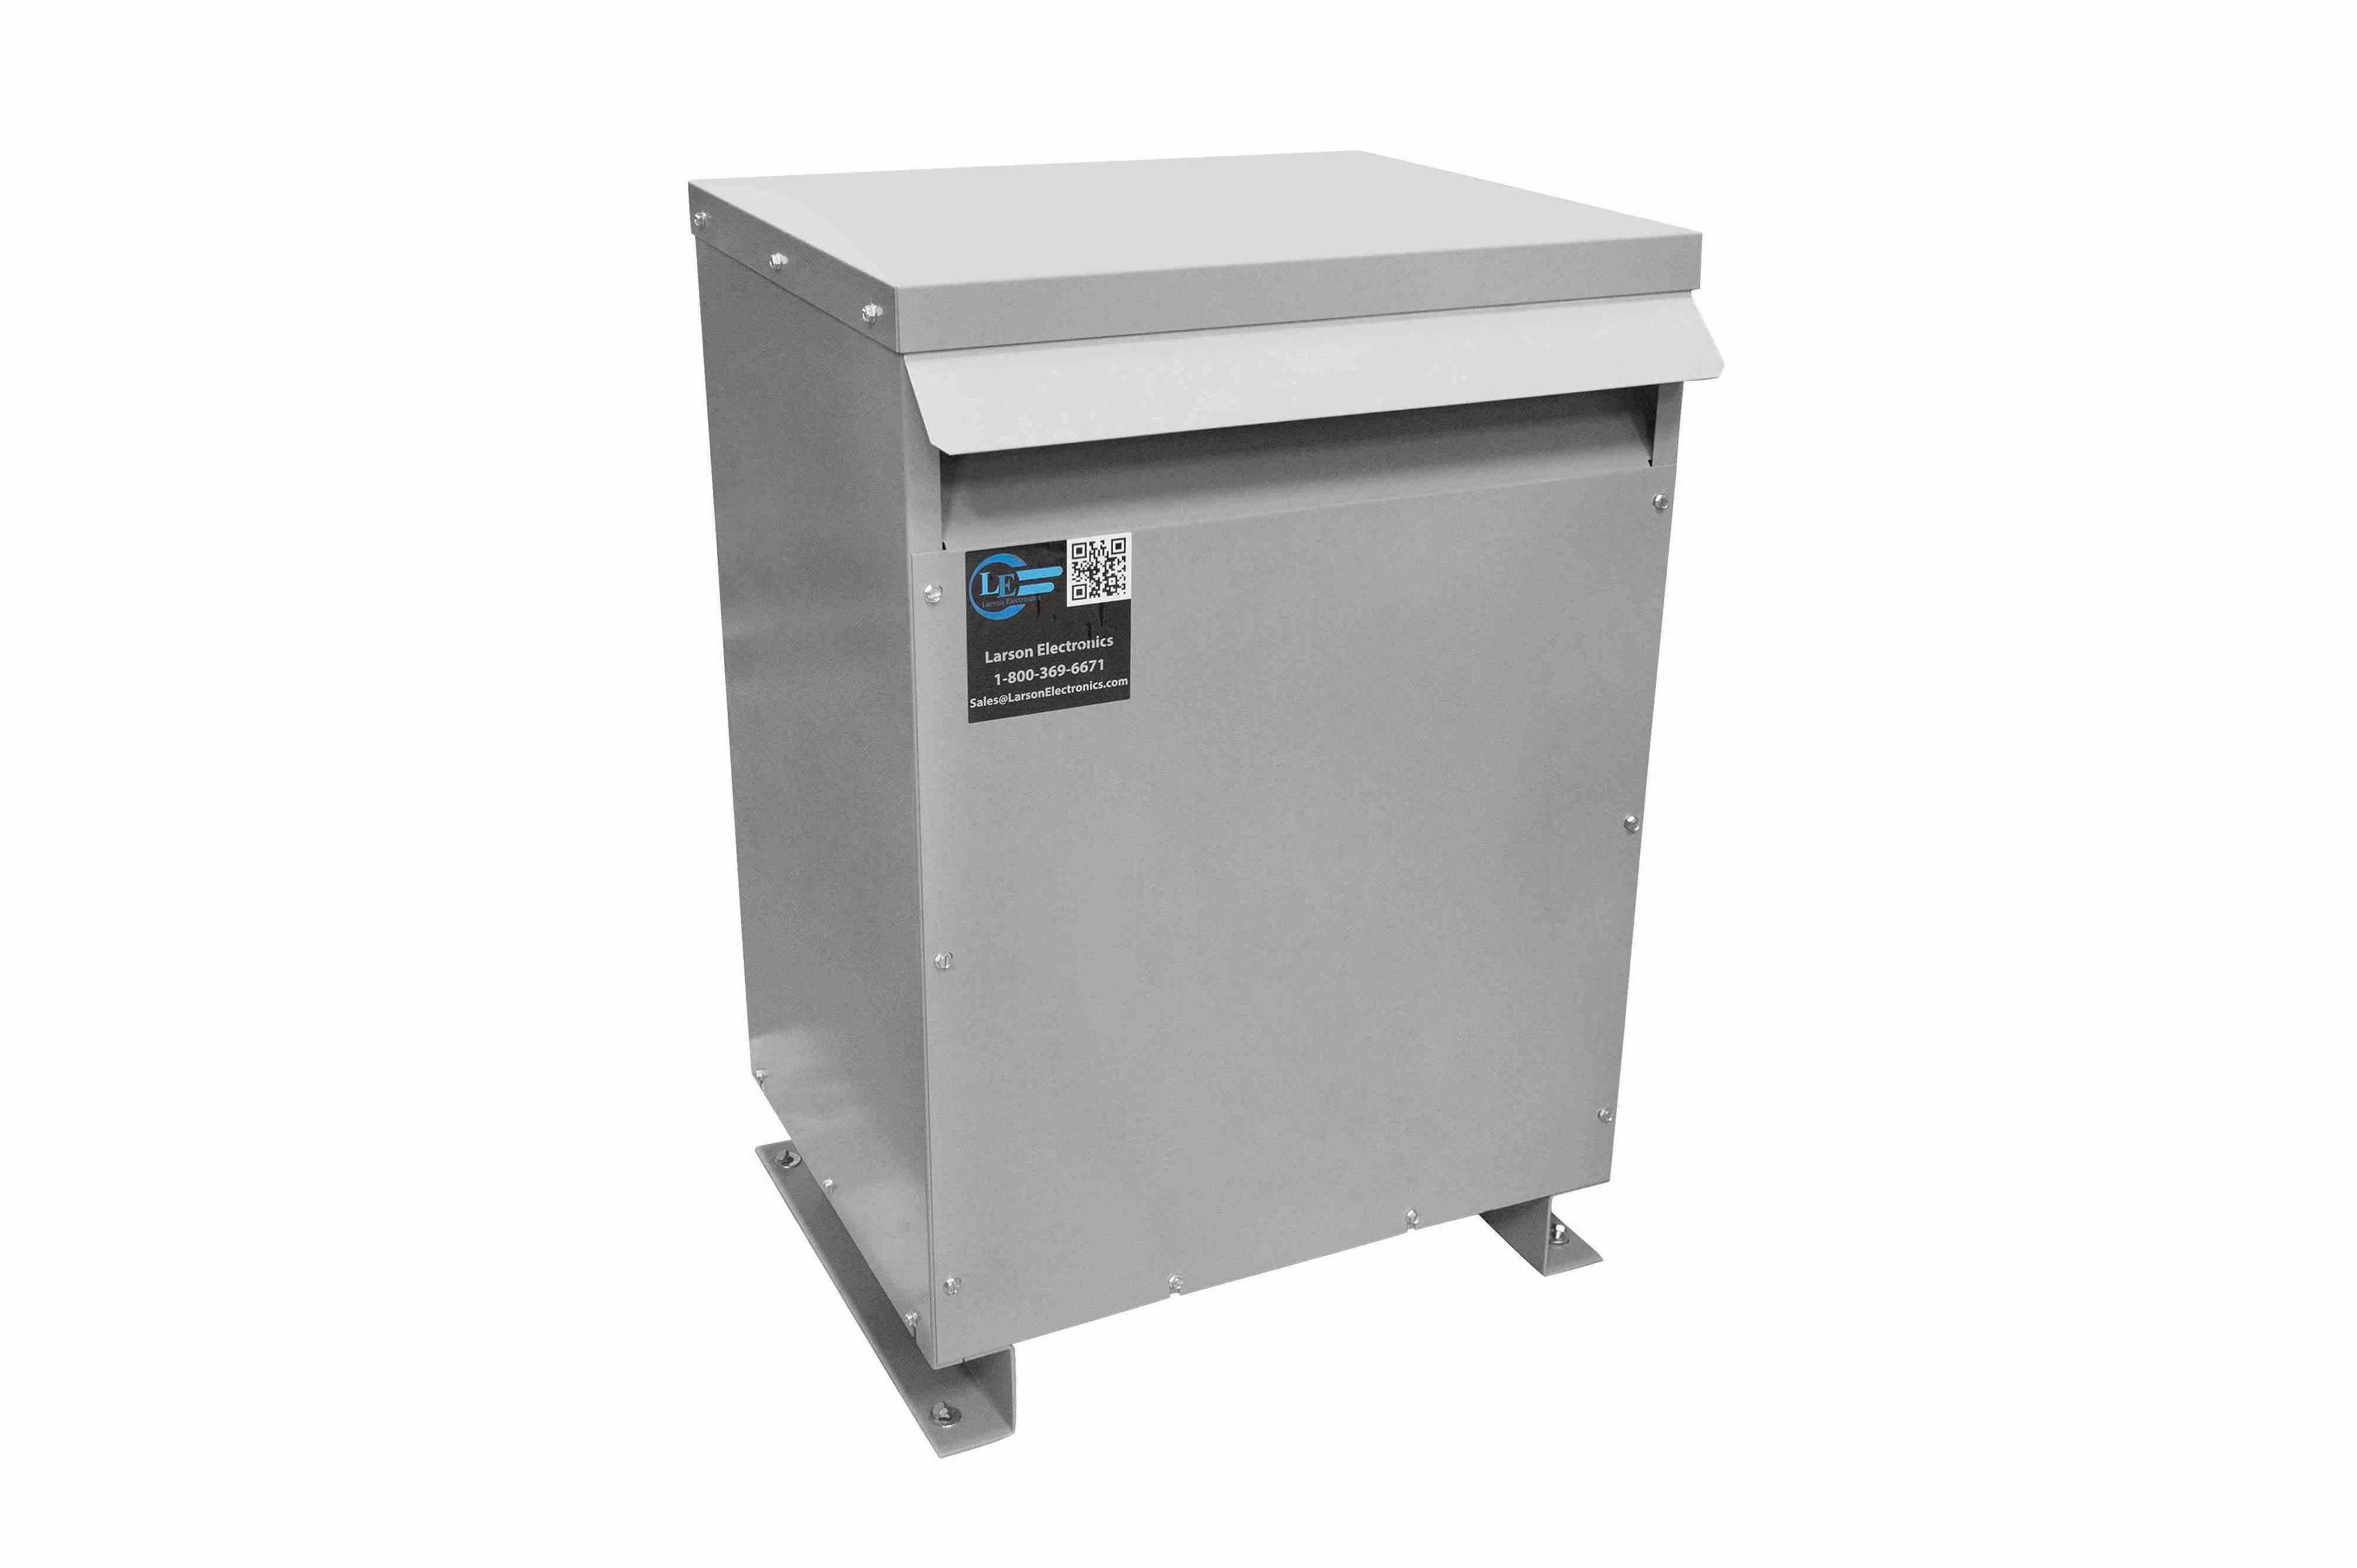 167 kVA 3PH DOE Transformer, 480V Delta Primary, 208Y/120 Wye-N Secondary, N3R, Ventilated, 60 Hz